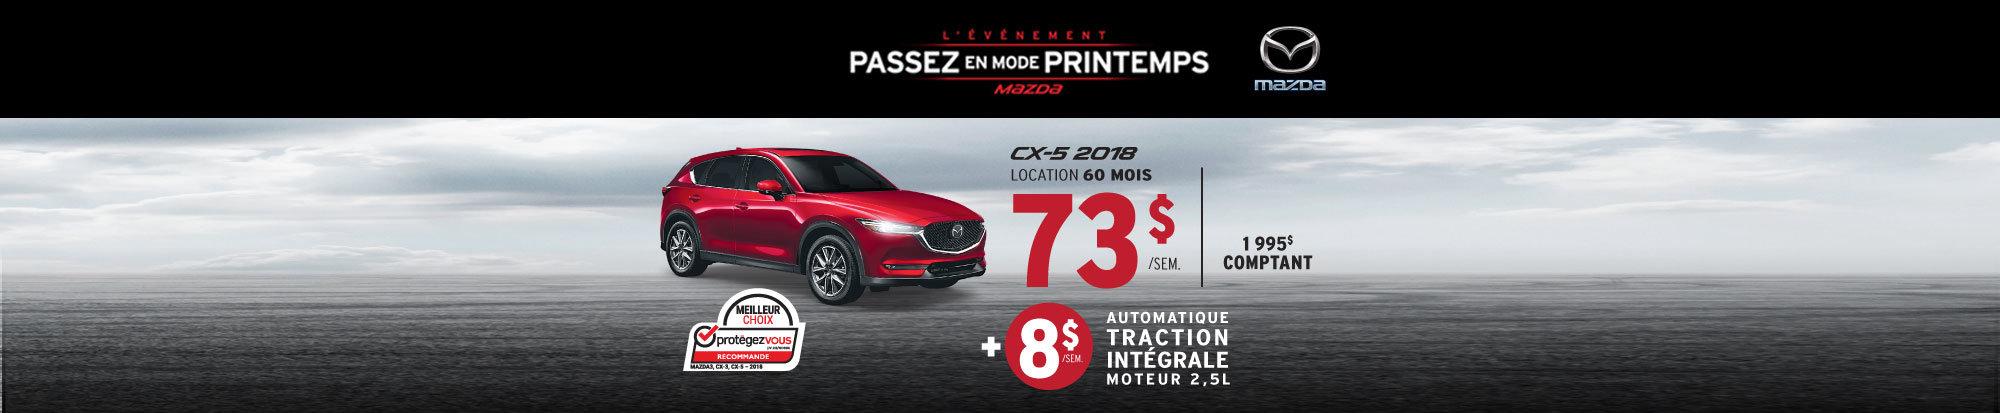 Mazda CX-5 2018 web